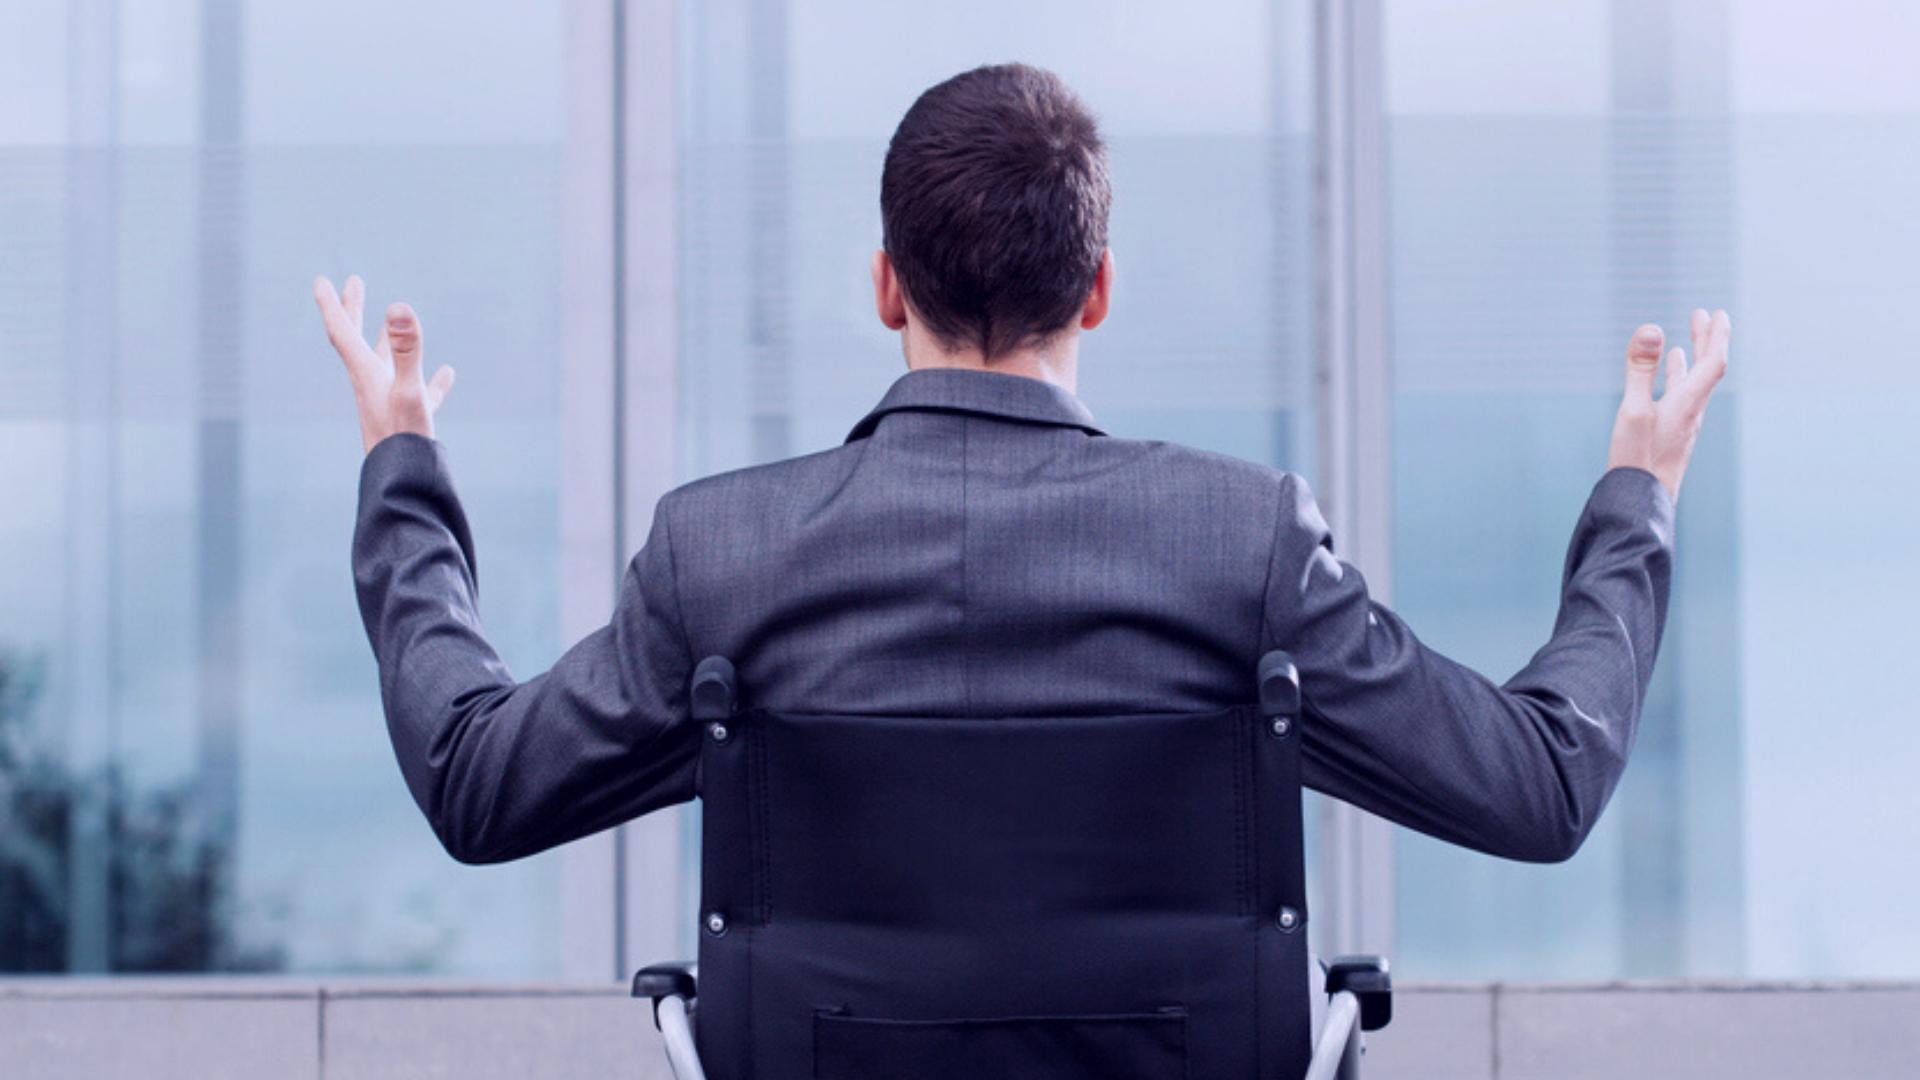 Access Rating | Handicap Access Rating | Disabled Access Reviews